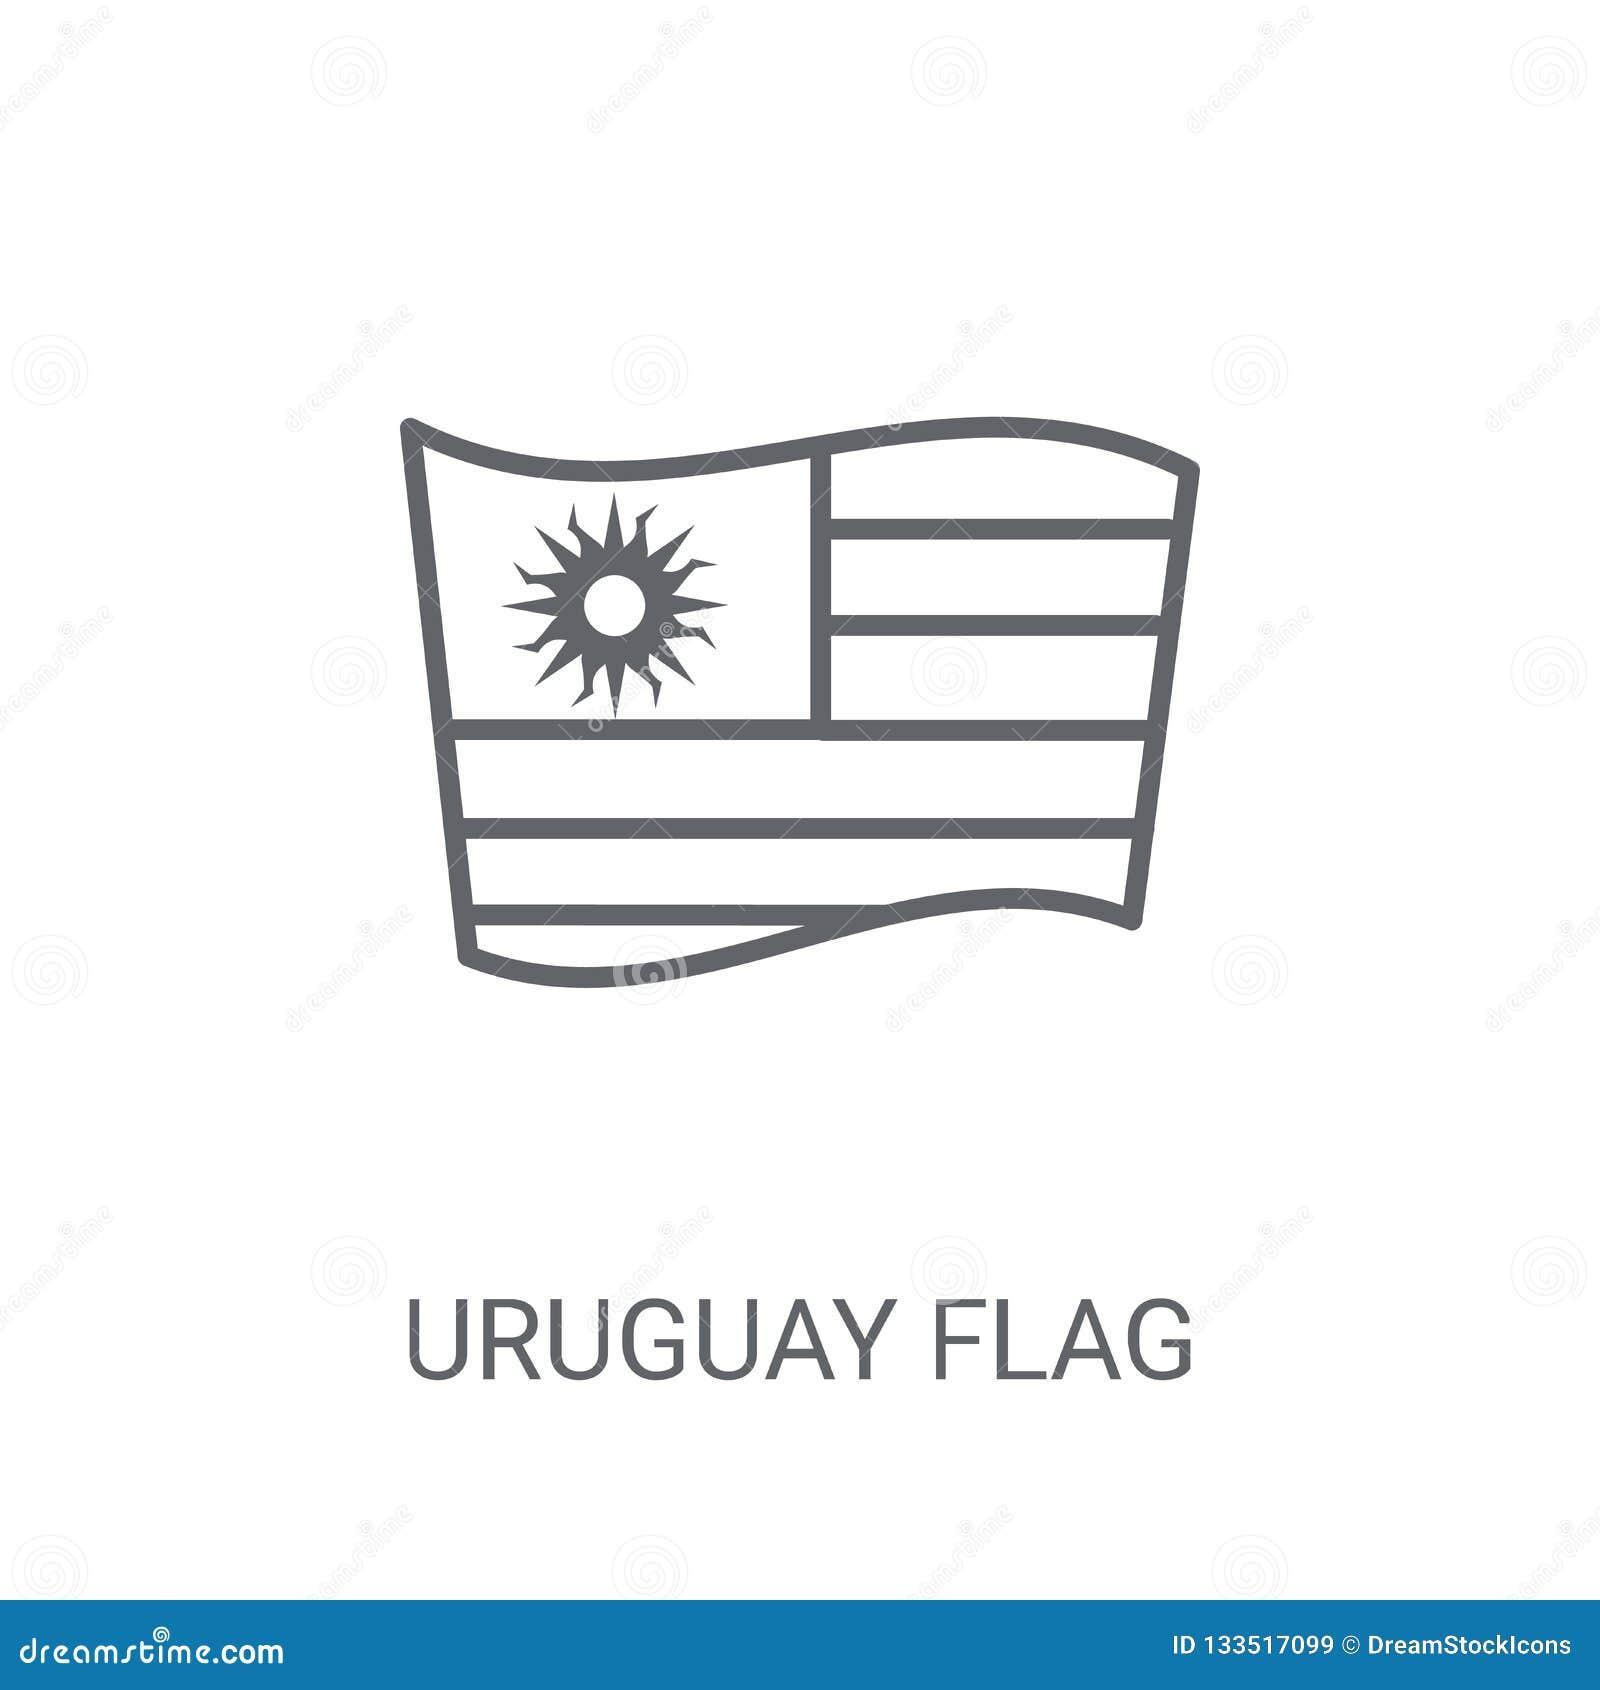 Uruguay-Flaggenikone Modisches Uruguay-Flaggenlogokonzept auf weißem BAC